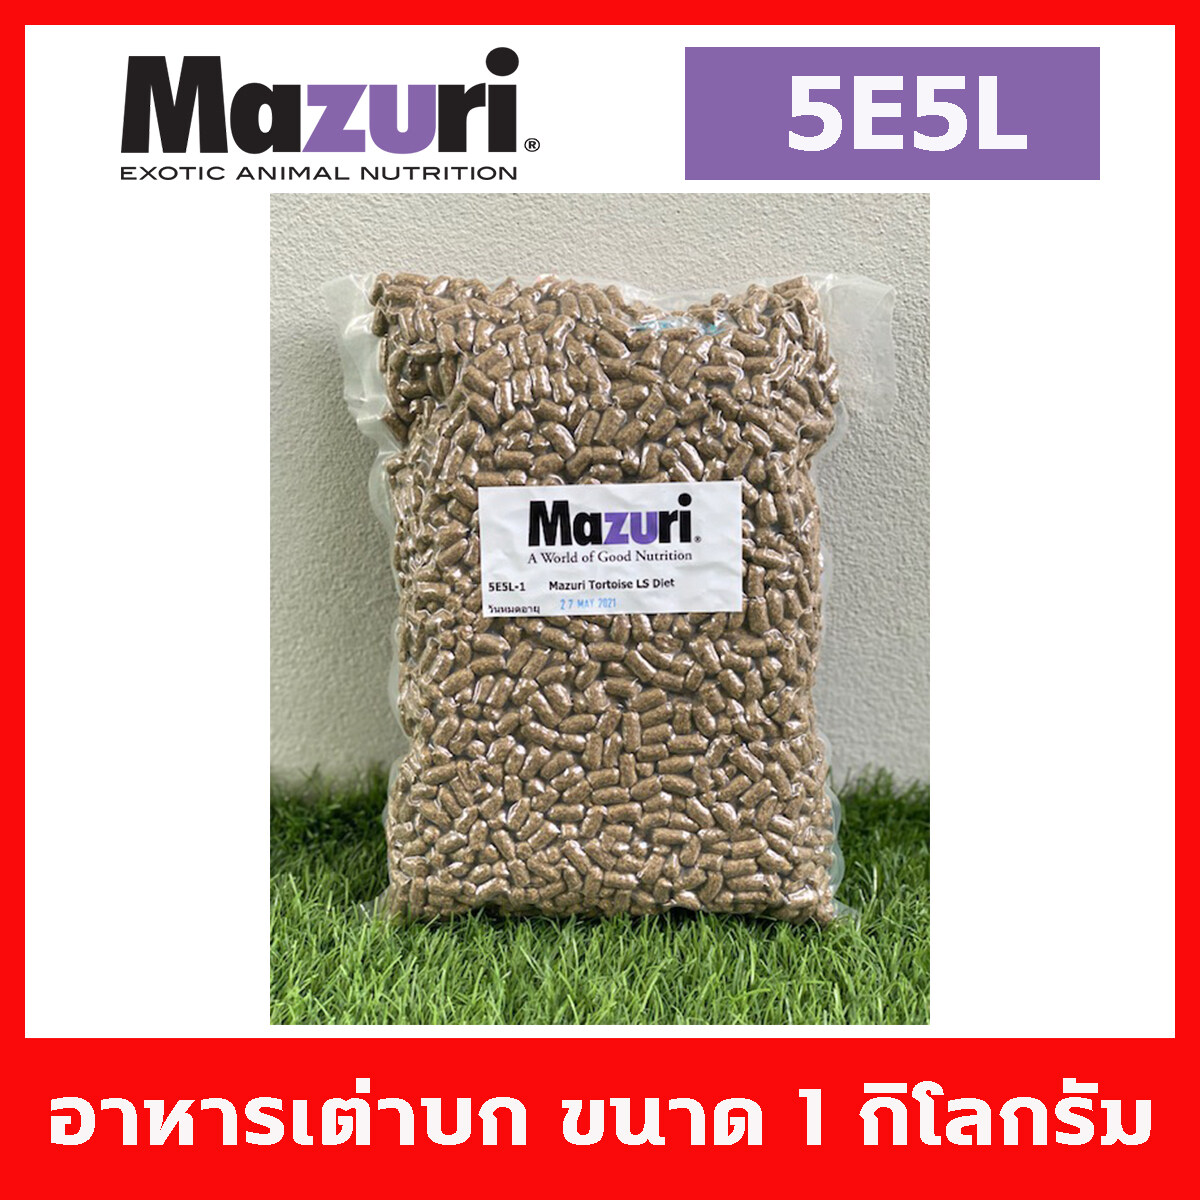 Mazuri Tortoise LS Diets อาหารเต่าบก และ สัตว์กินพืช มาซูริ ขนาด 1 กิโลกรัม สูตร 5E5L สูตรใหม่